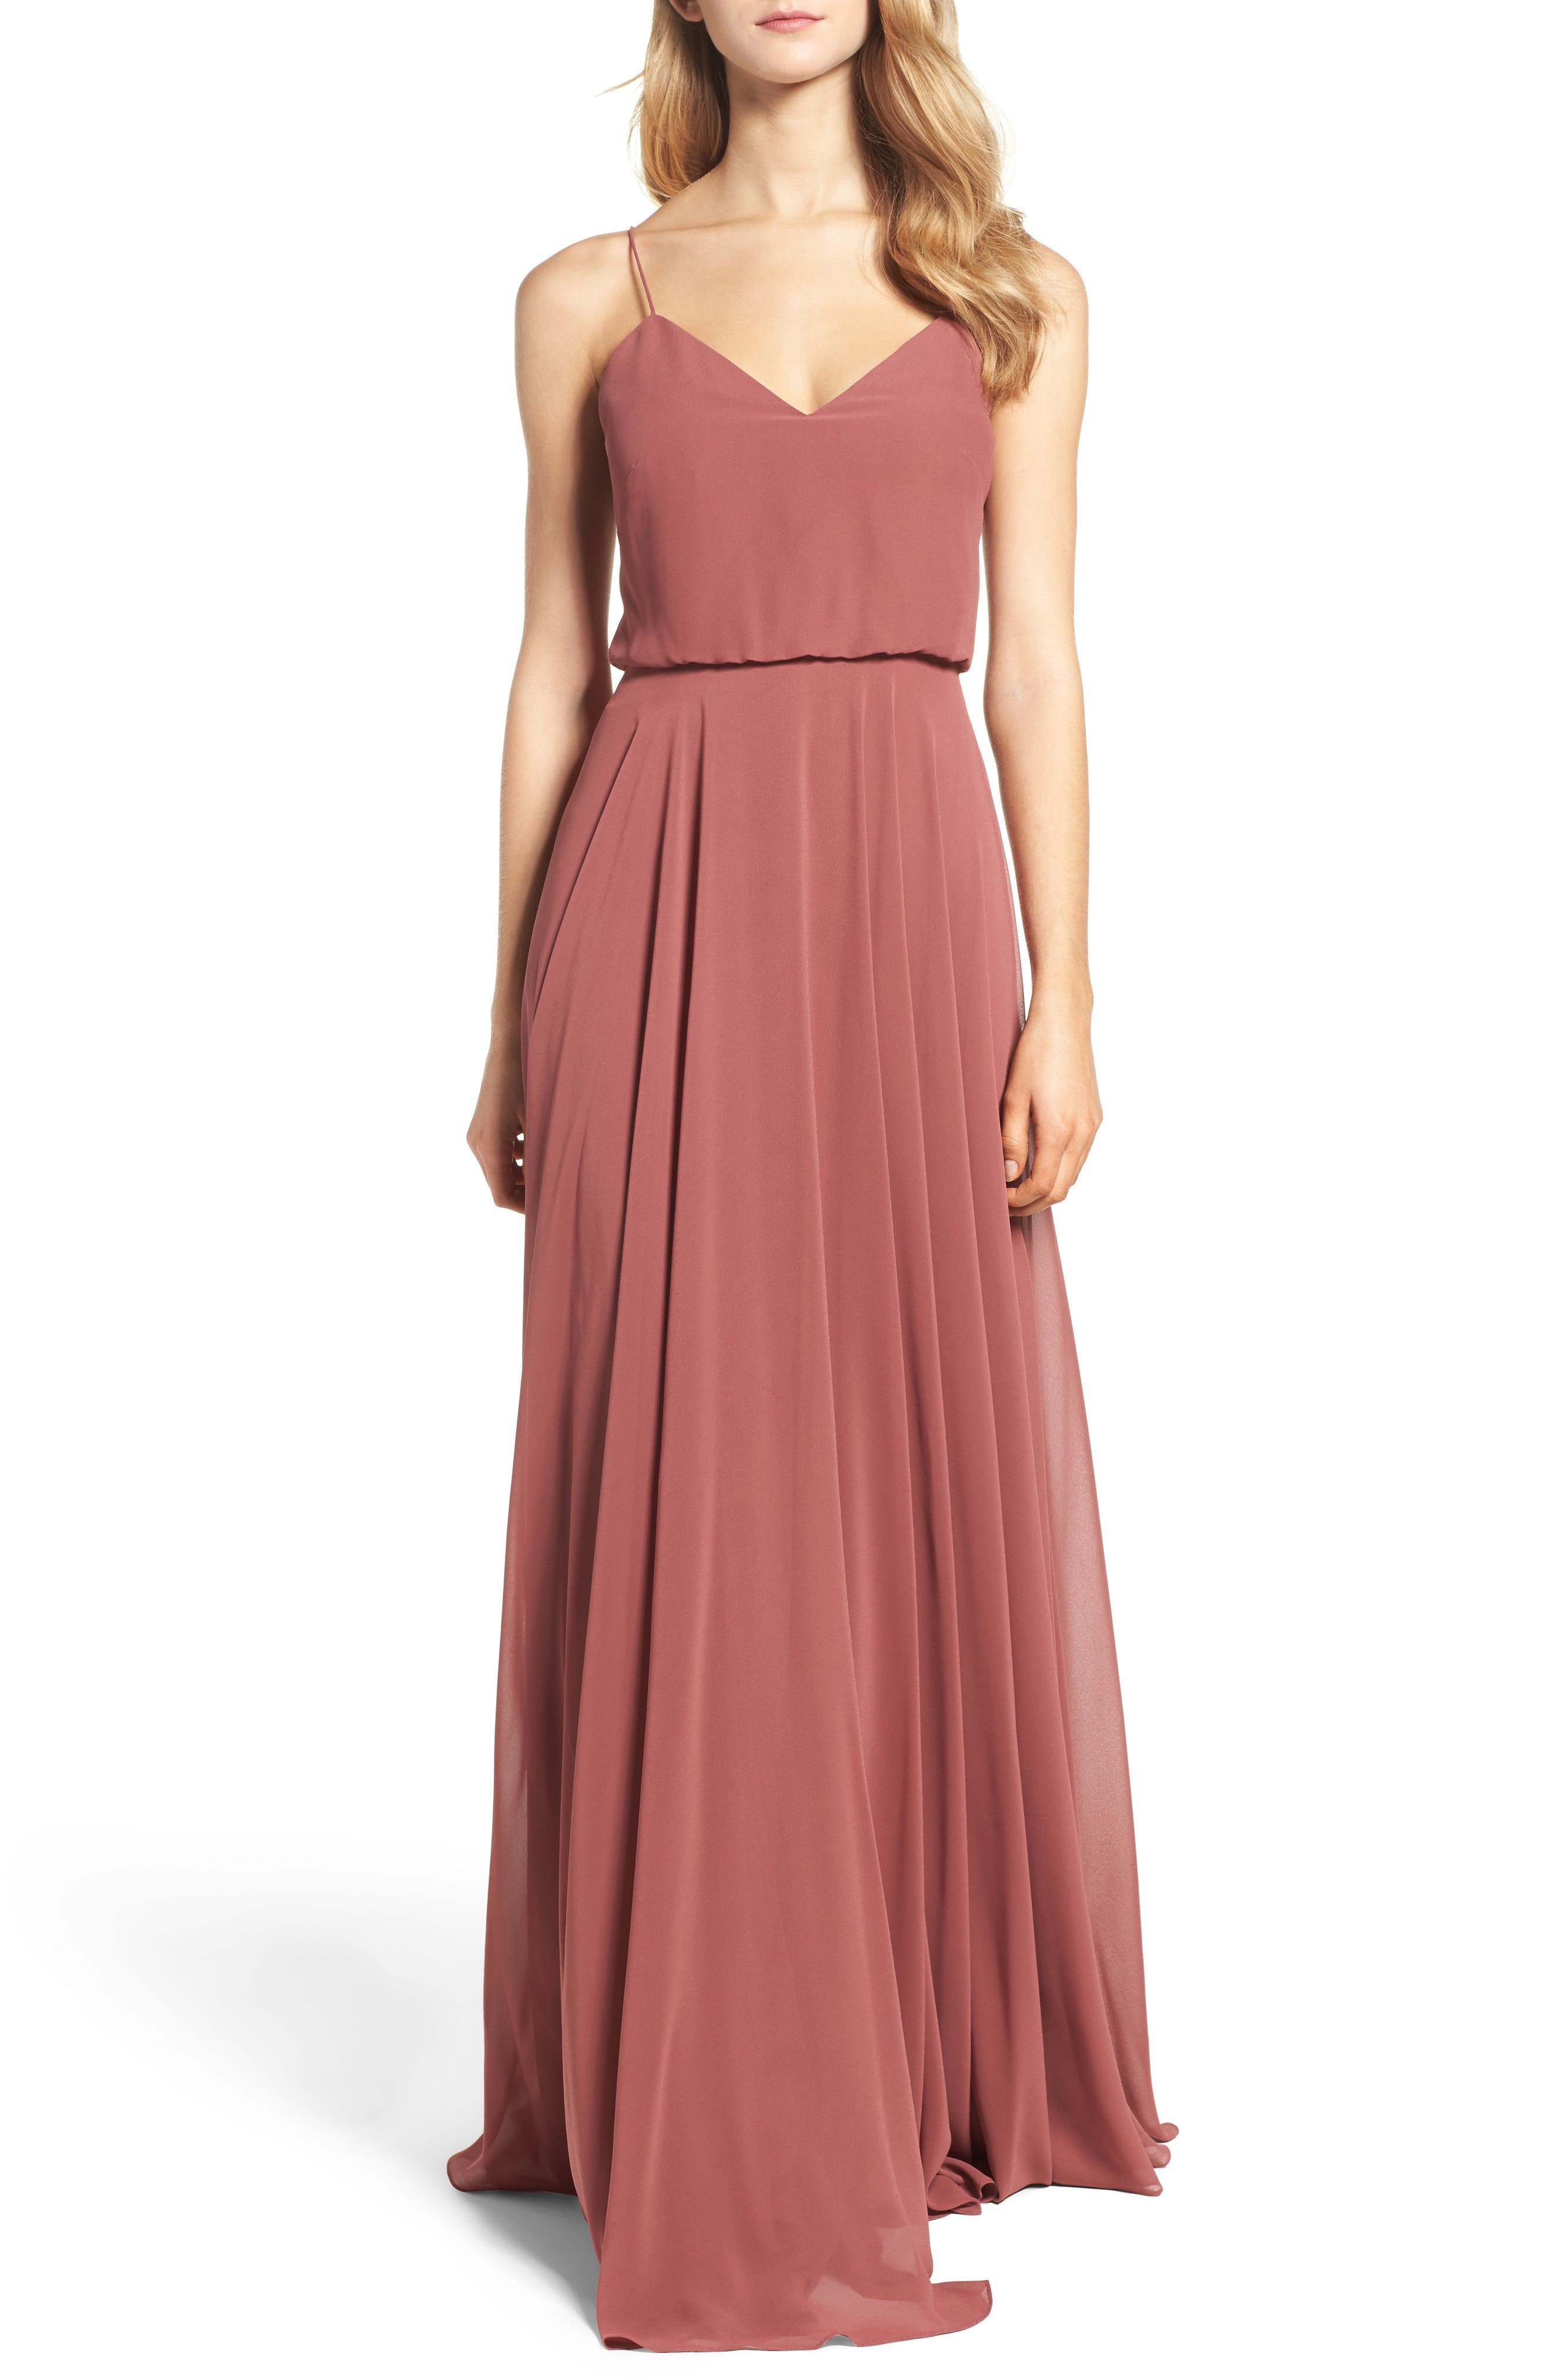 Inesse Chiffon V-Neck Spaghetti Strap Gown in Cinnamon Rose